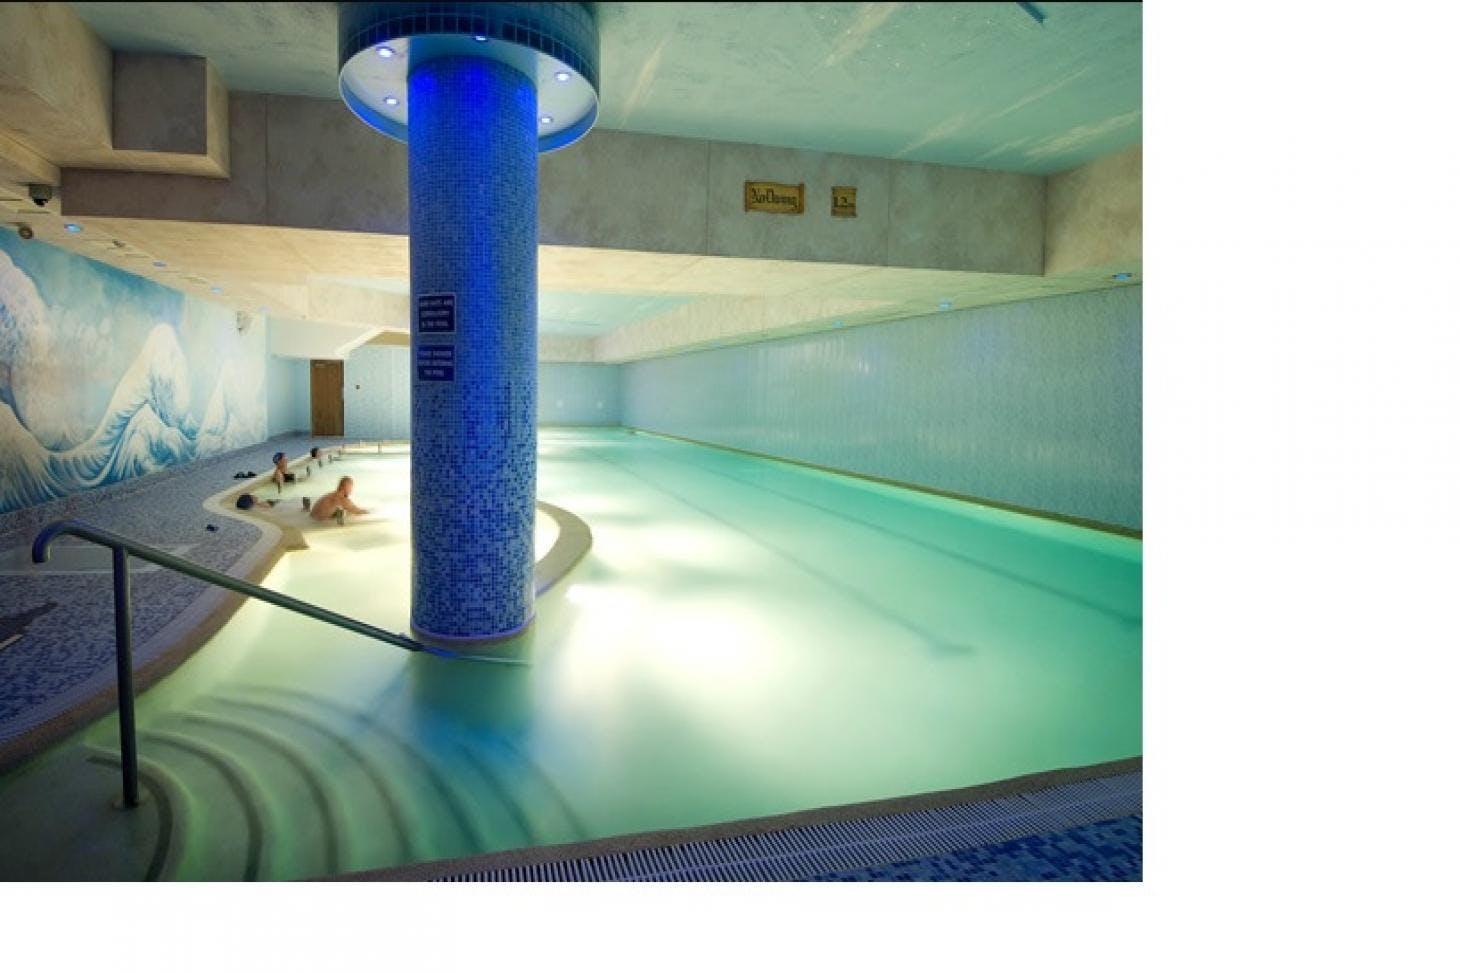 West Wood Health Club, Sandymount Indoor swimming pool